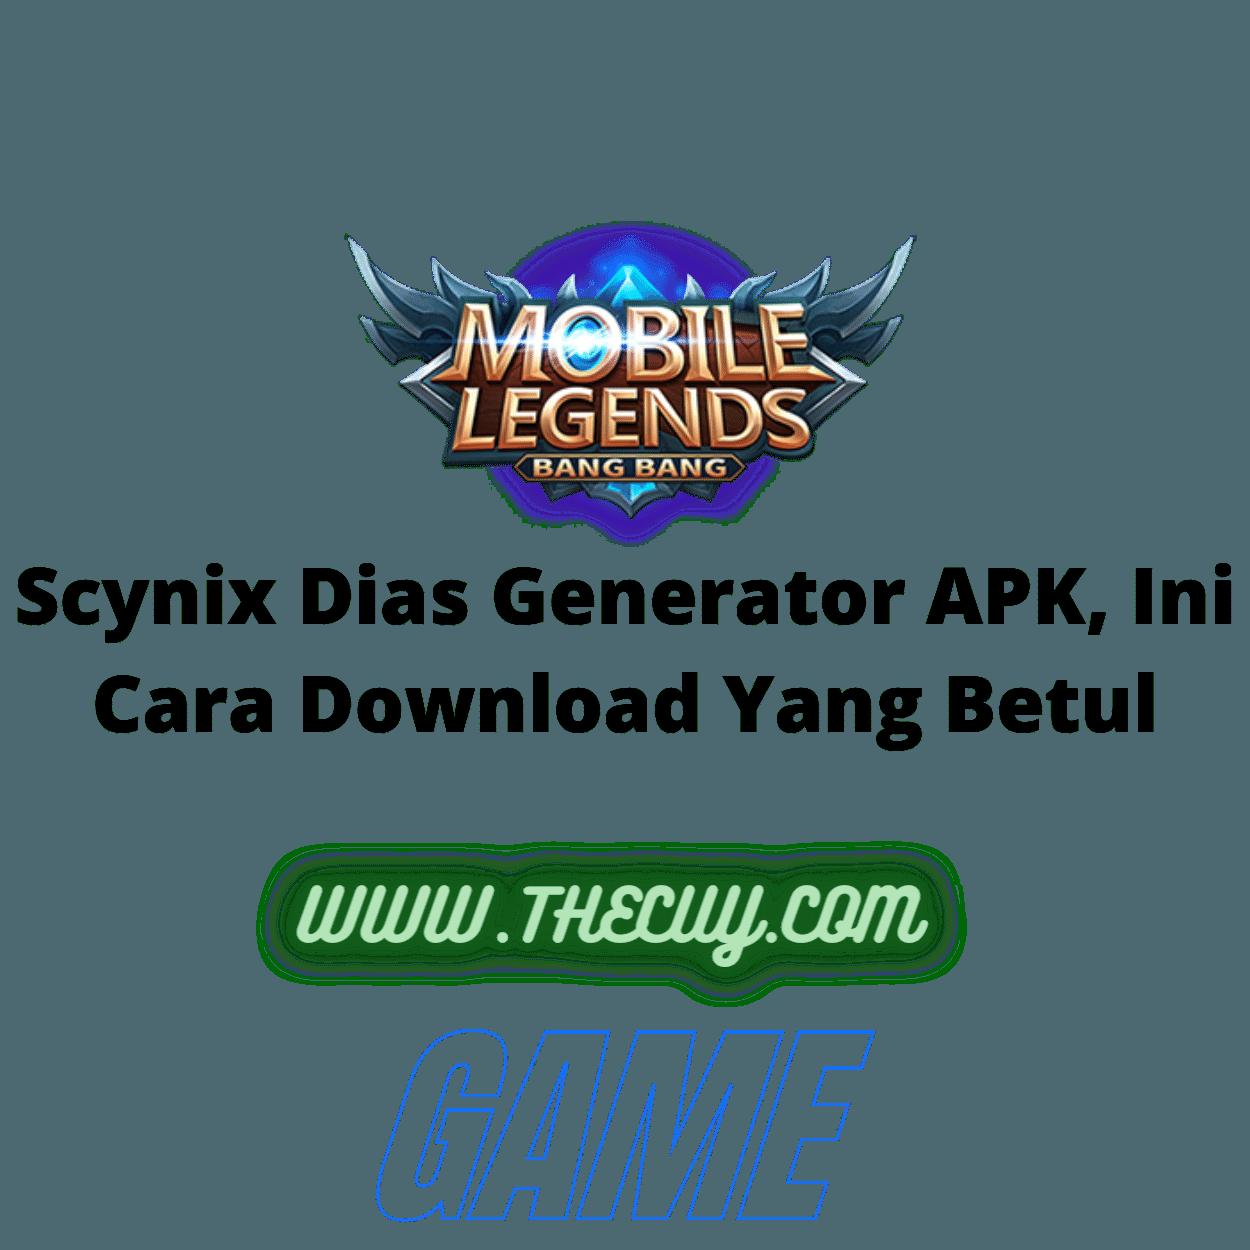 Scynix Dias Generator APK, Ini Cara Download Yang Betul